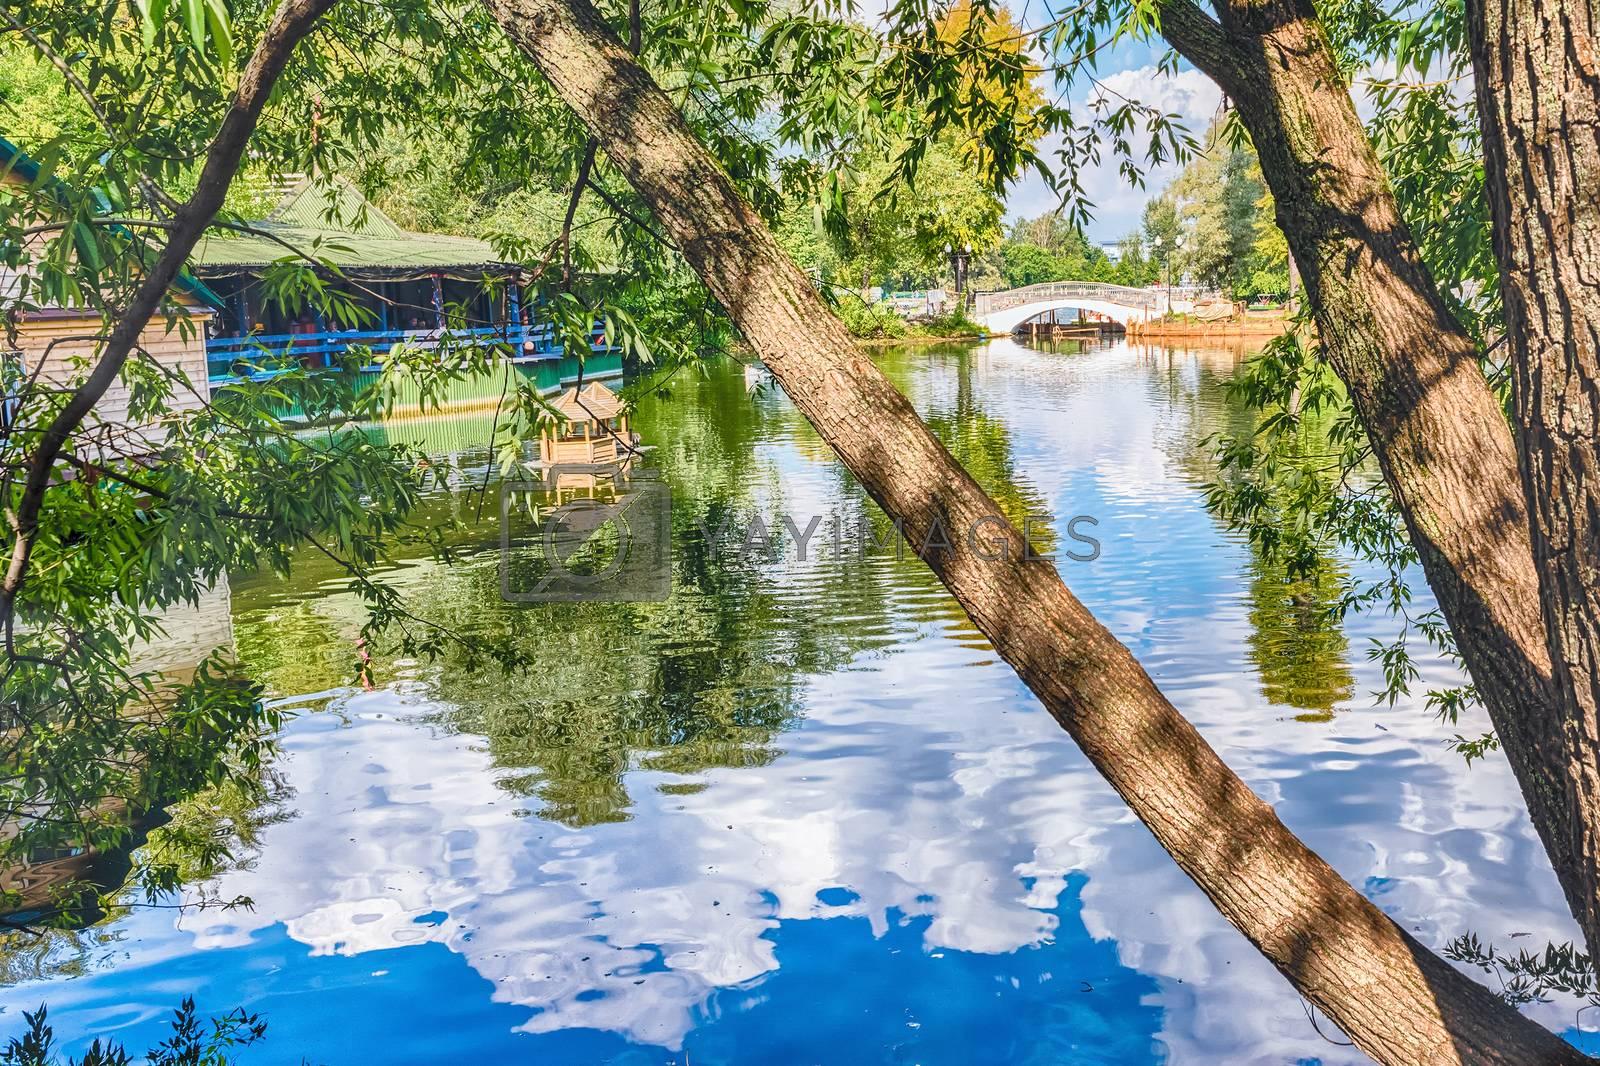 Idillic lake inside Gorky Park, Moscow, Russia by Marco Rubino